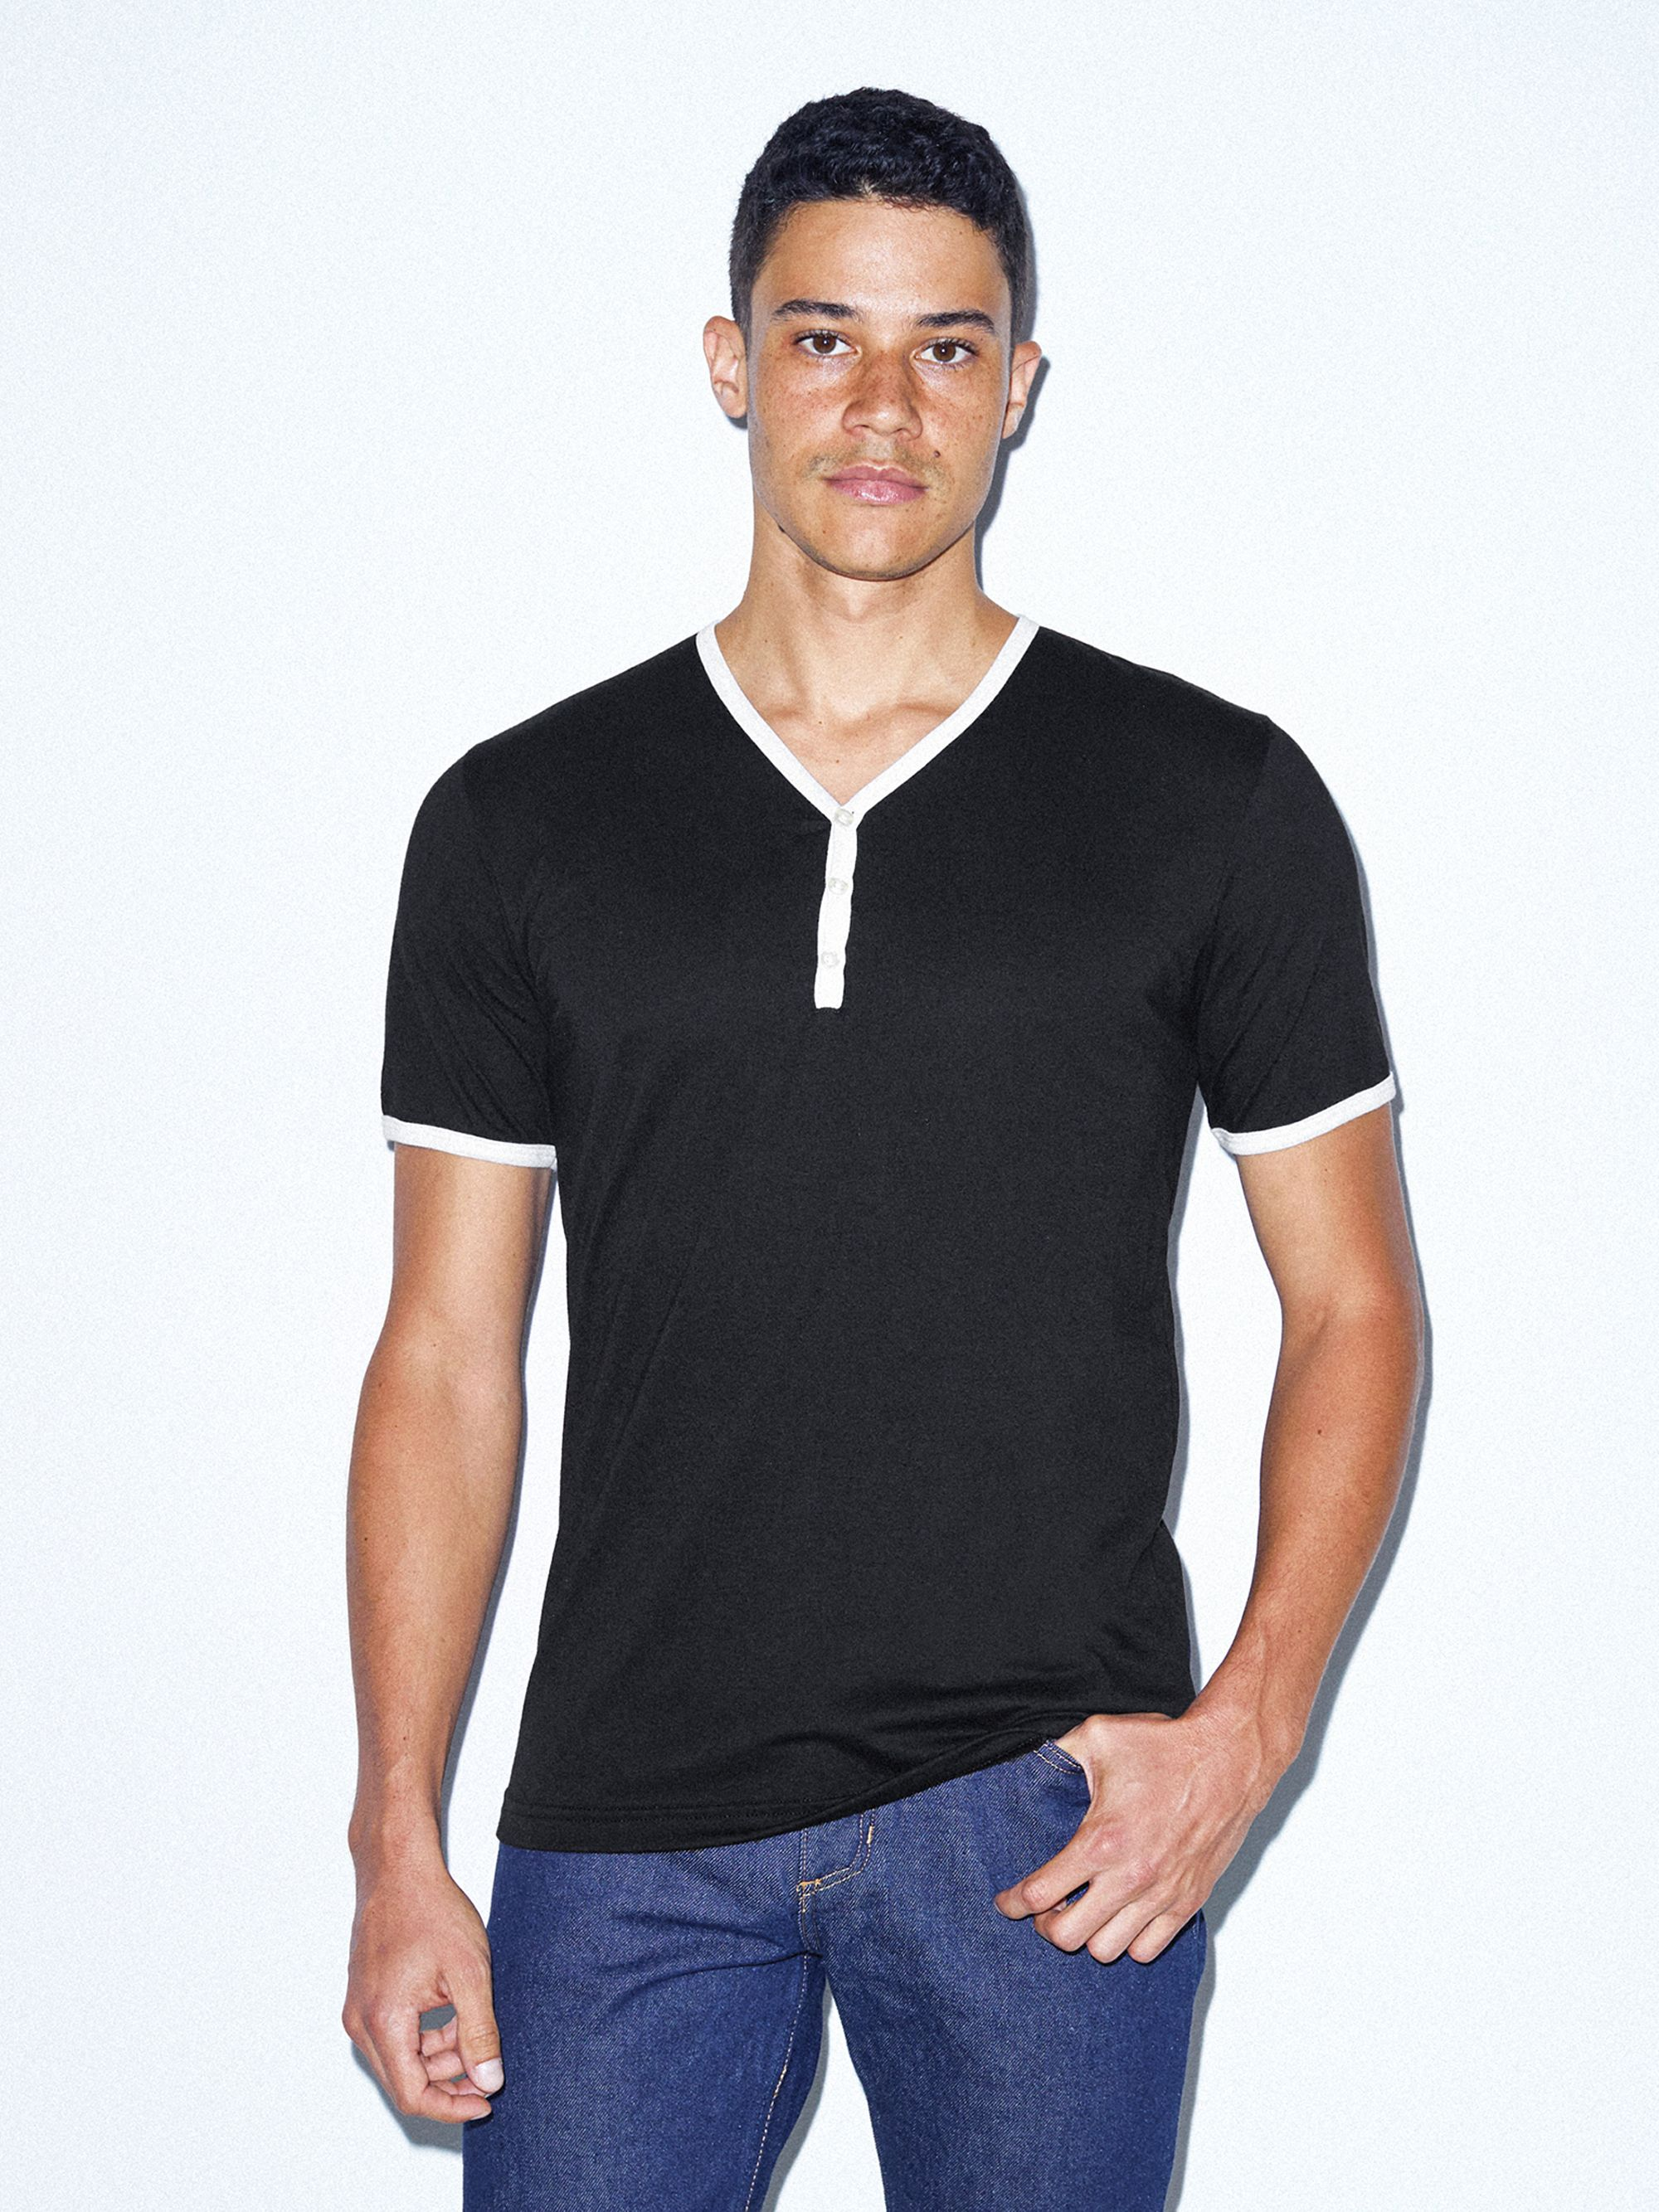 50/50 Henley Ringer V Neck T Shirt by American Apparel